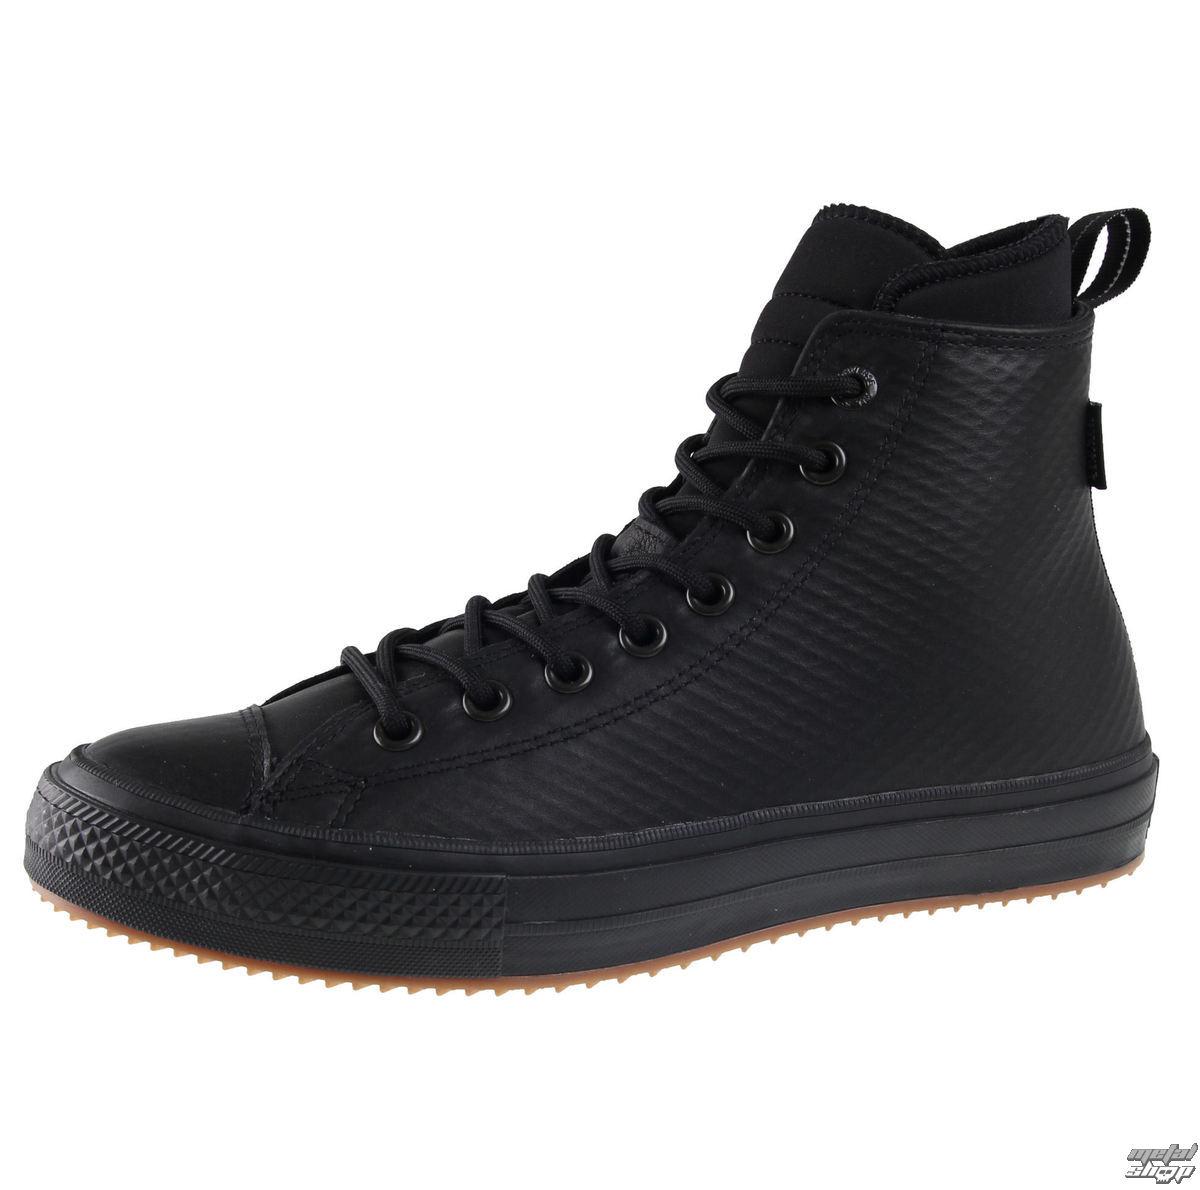 boty zimní CONVERSE - Chuck Taylor All Star II Boot - BLK BLK BLK ... fc5eddf0dc